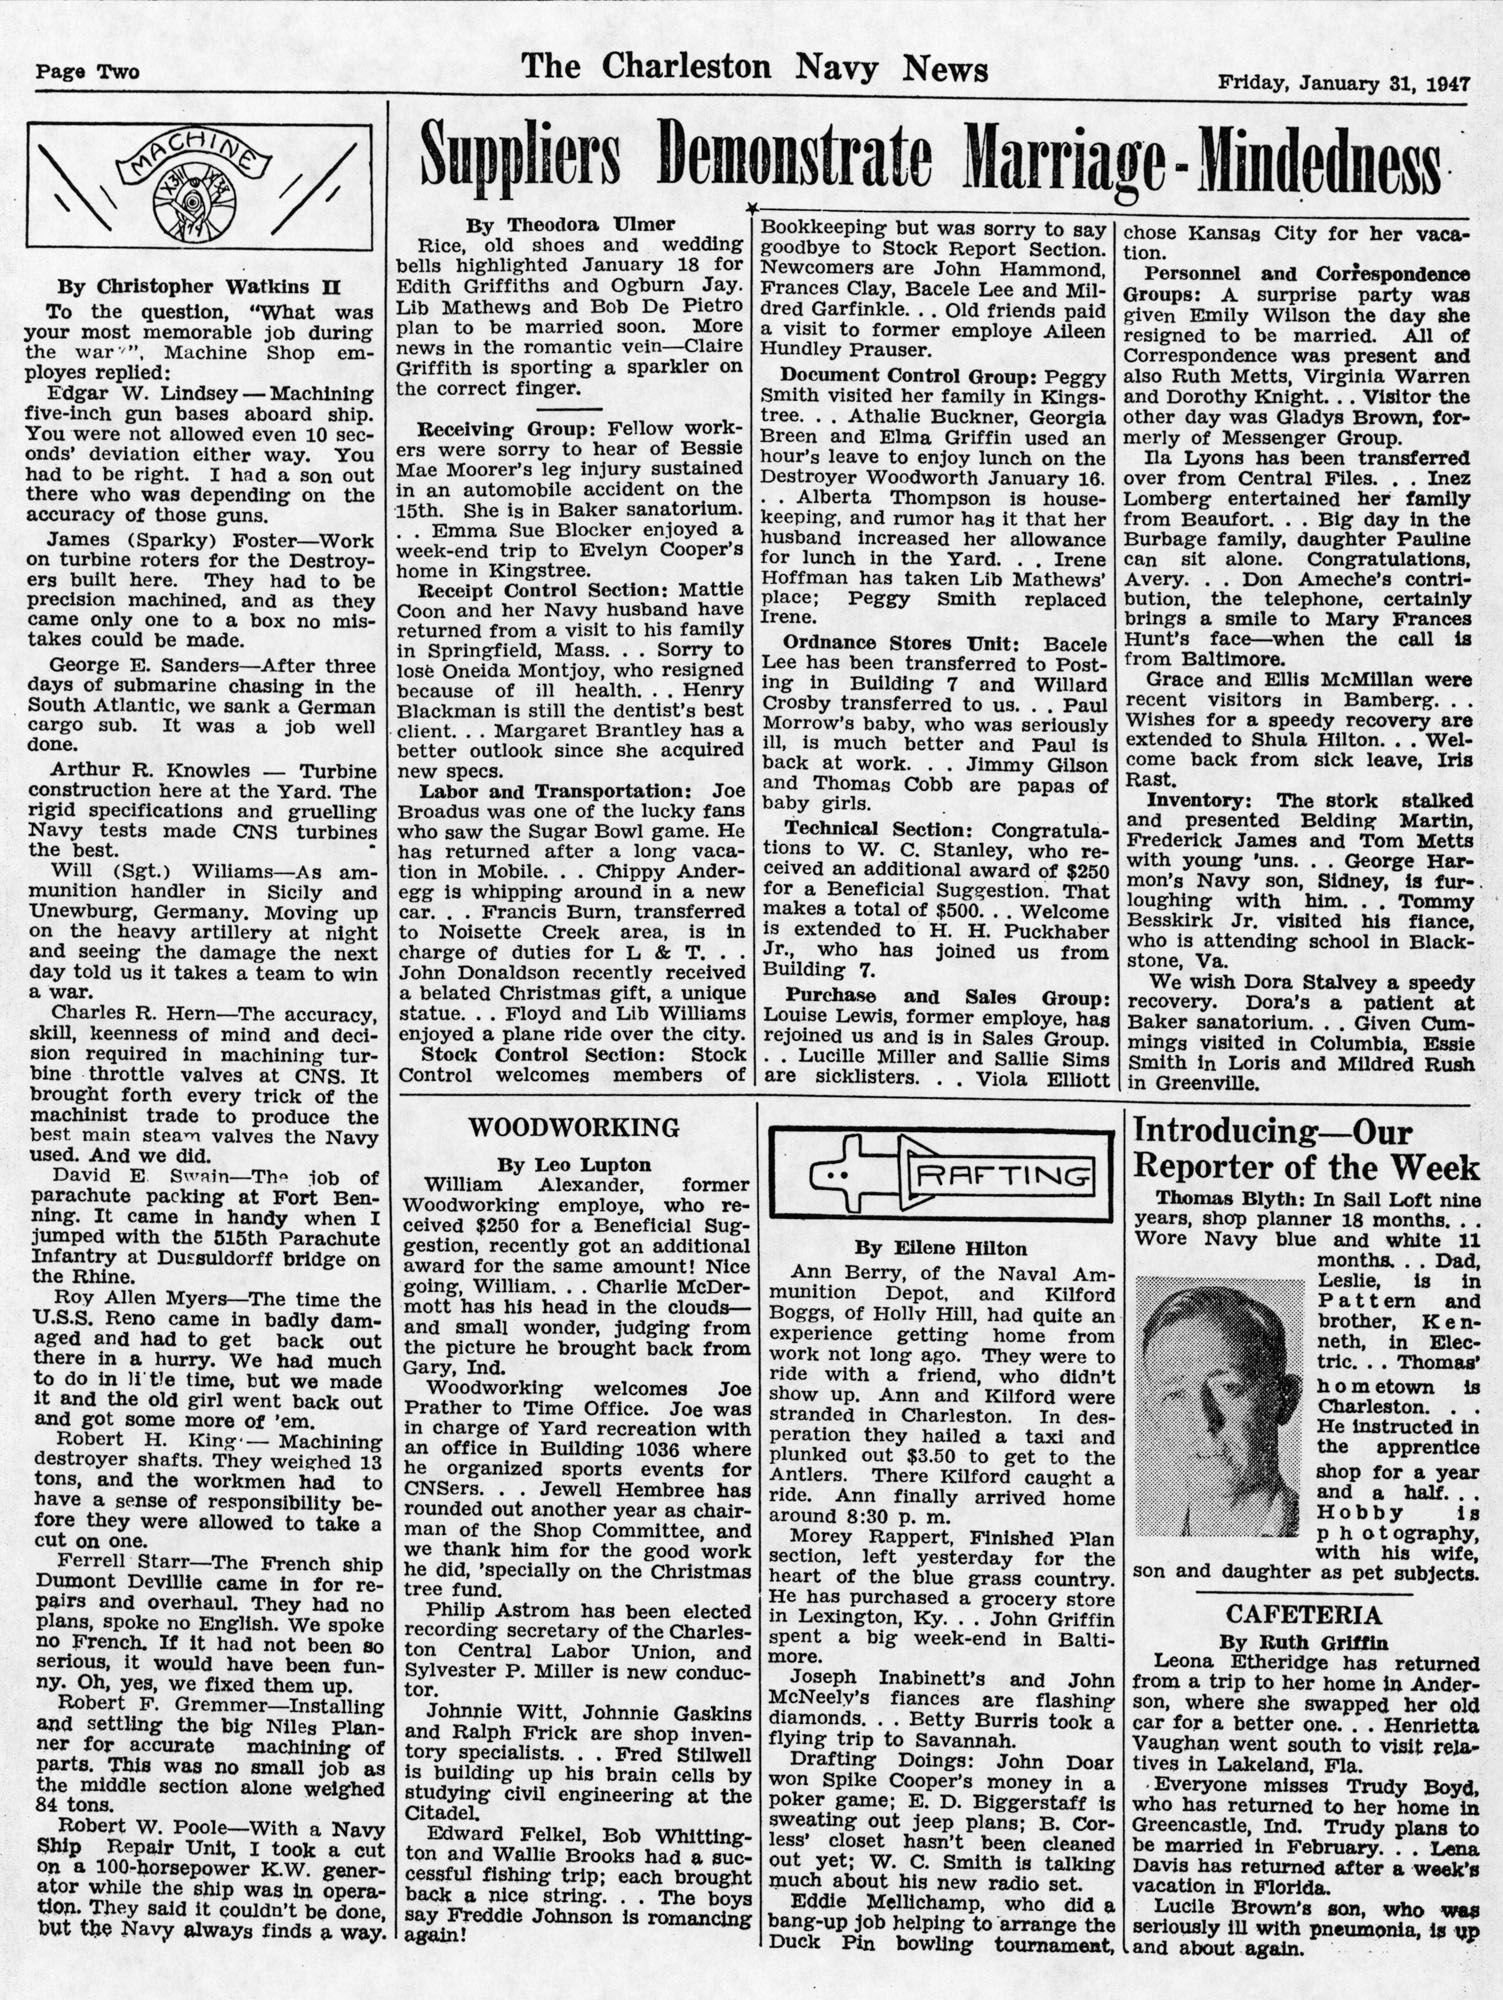 The Charleston Navy News, Volume 5, Edition 13, page ii